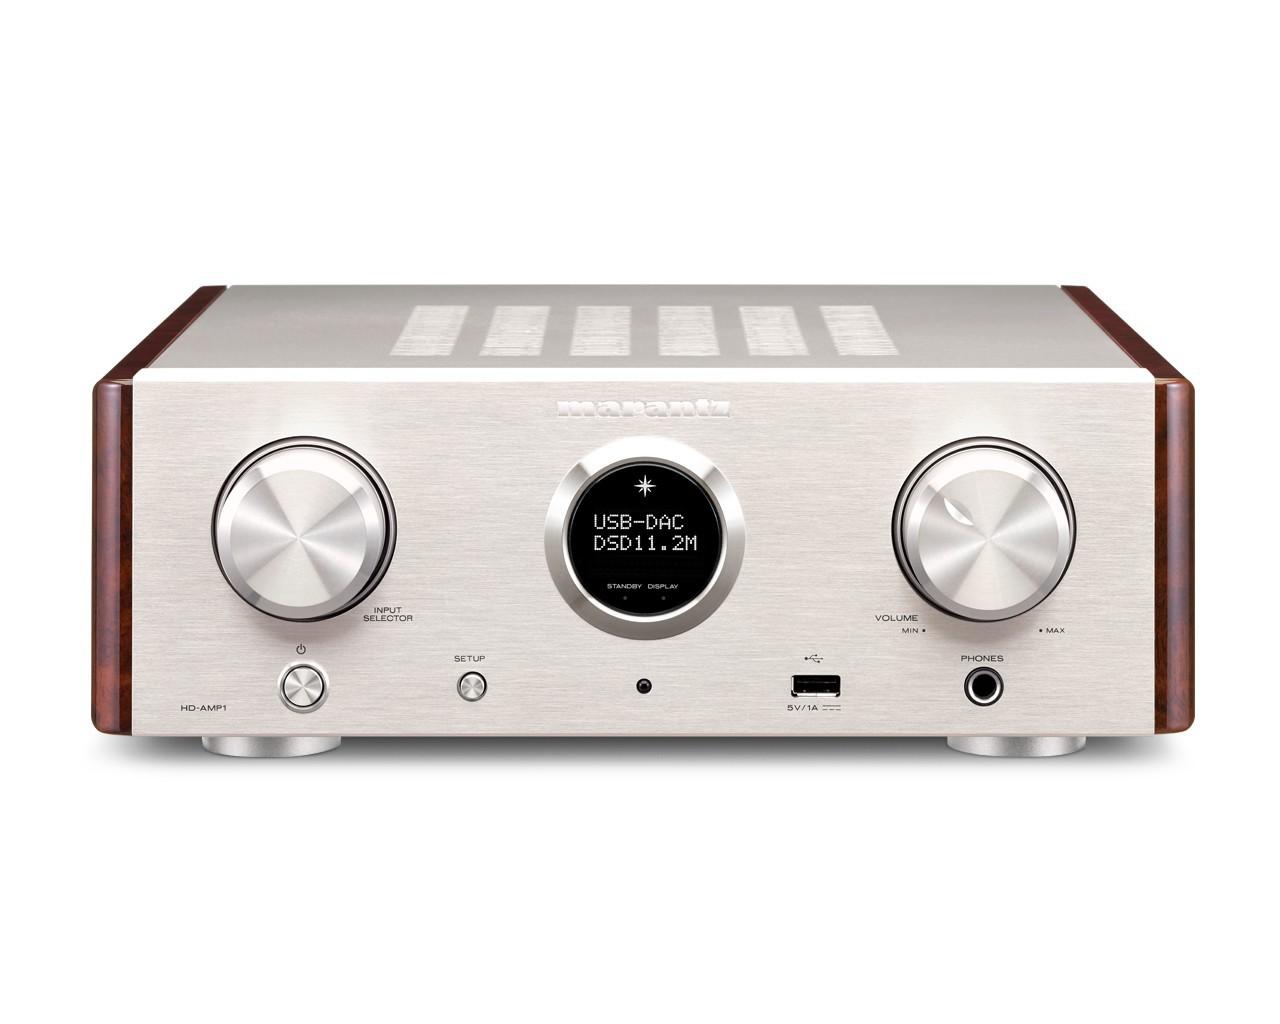 Стерео усилитель с ЦАП: Marantz HD-AMP 1 Silver Gold -